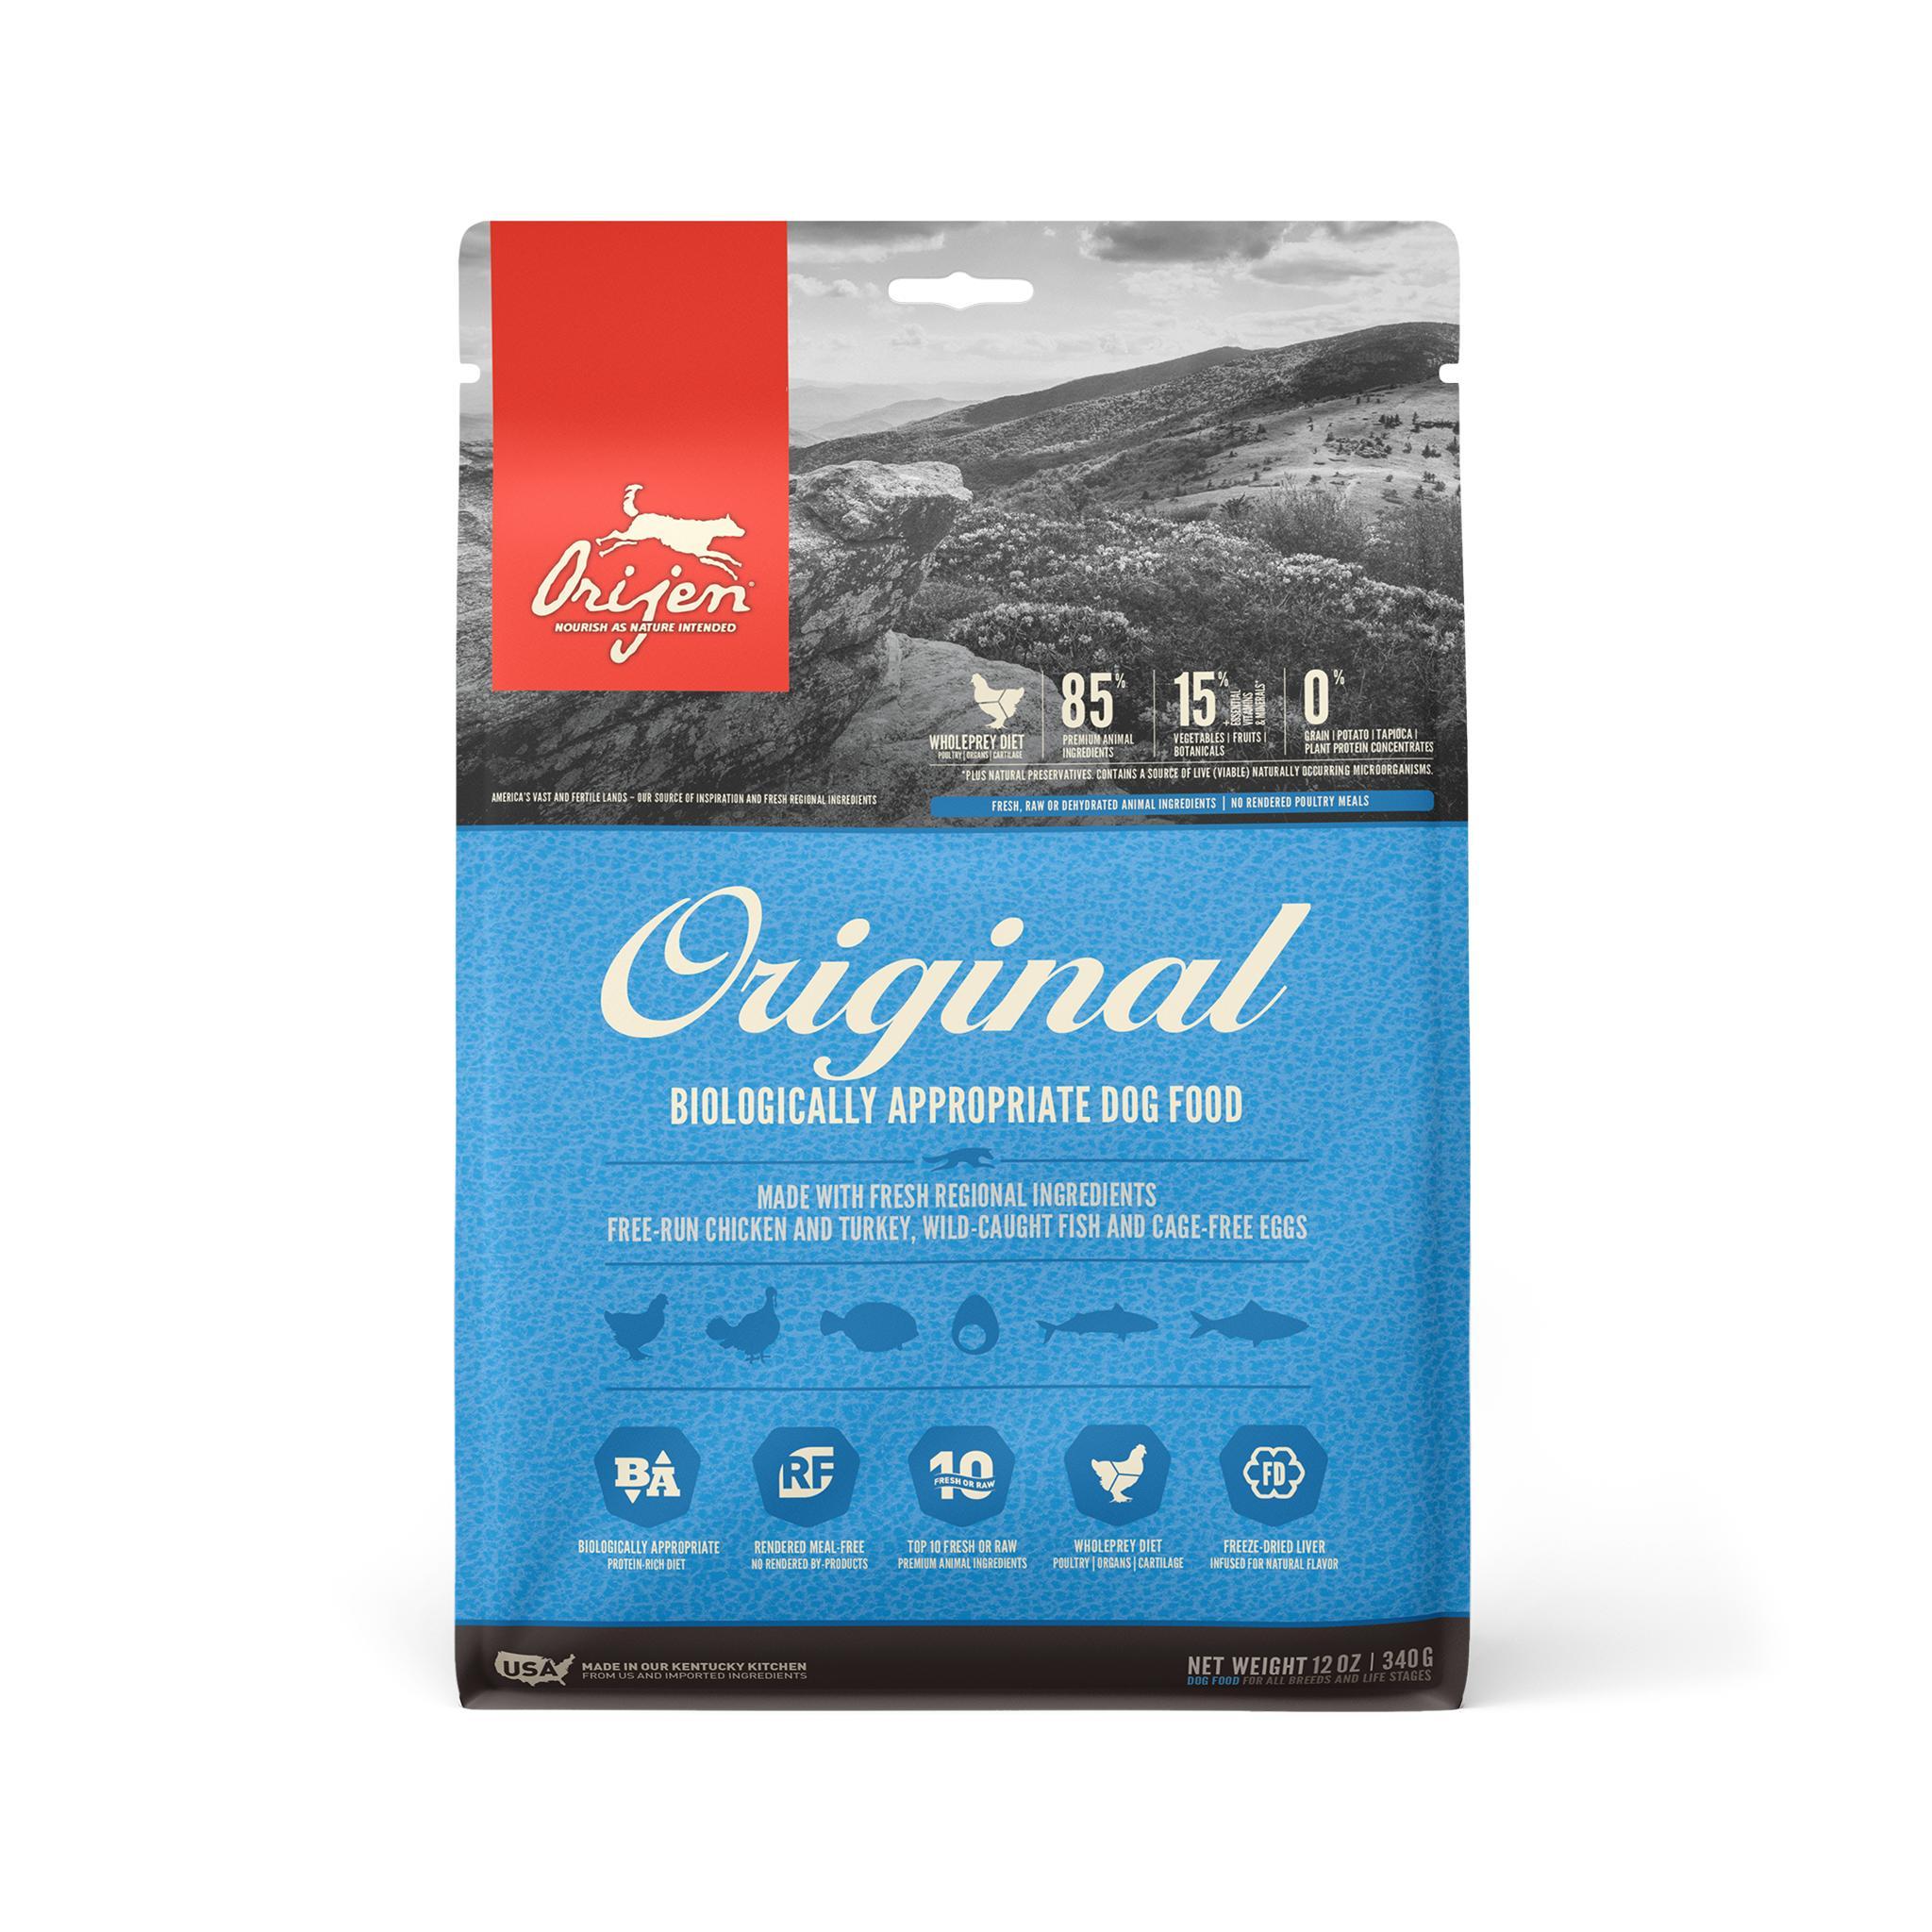 ORIJEN Original Grain-Free Dry Dog Food Image